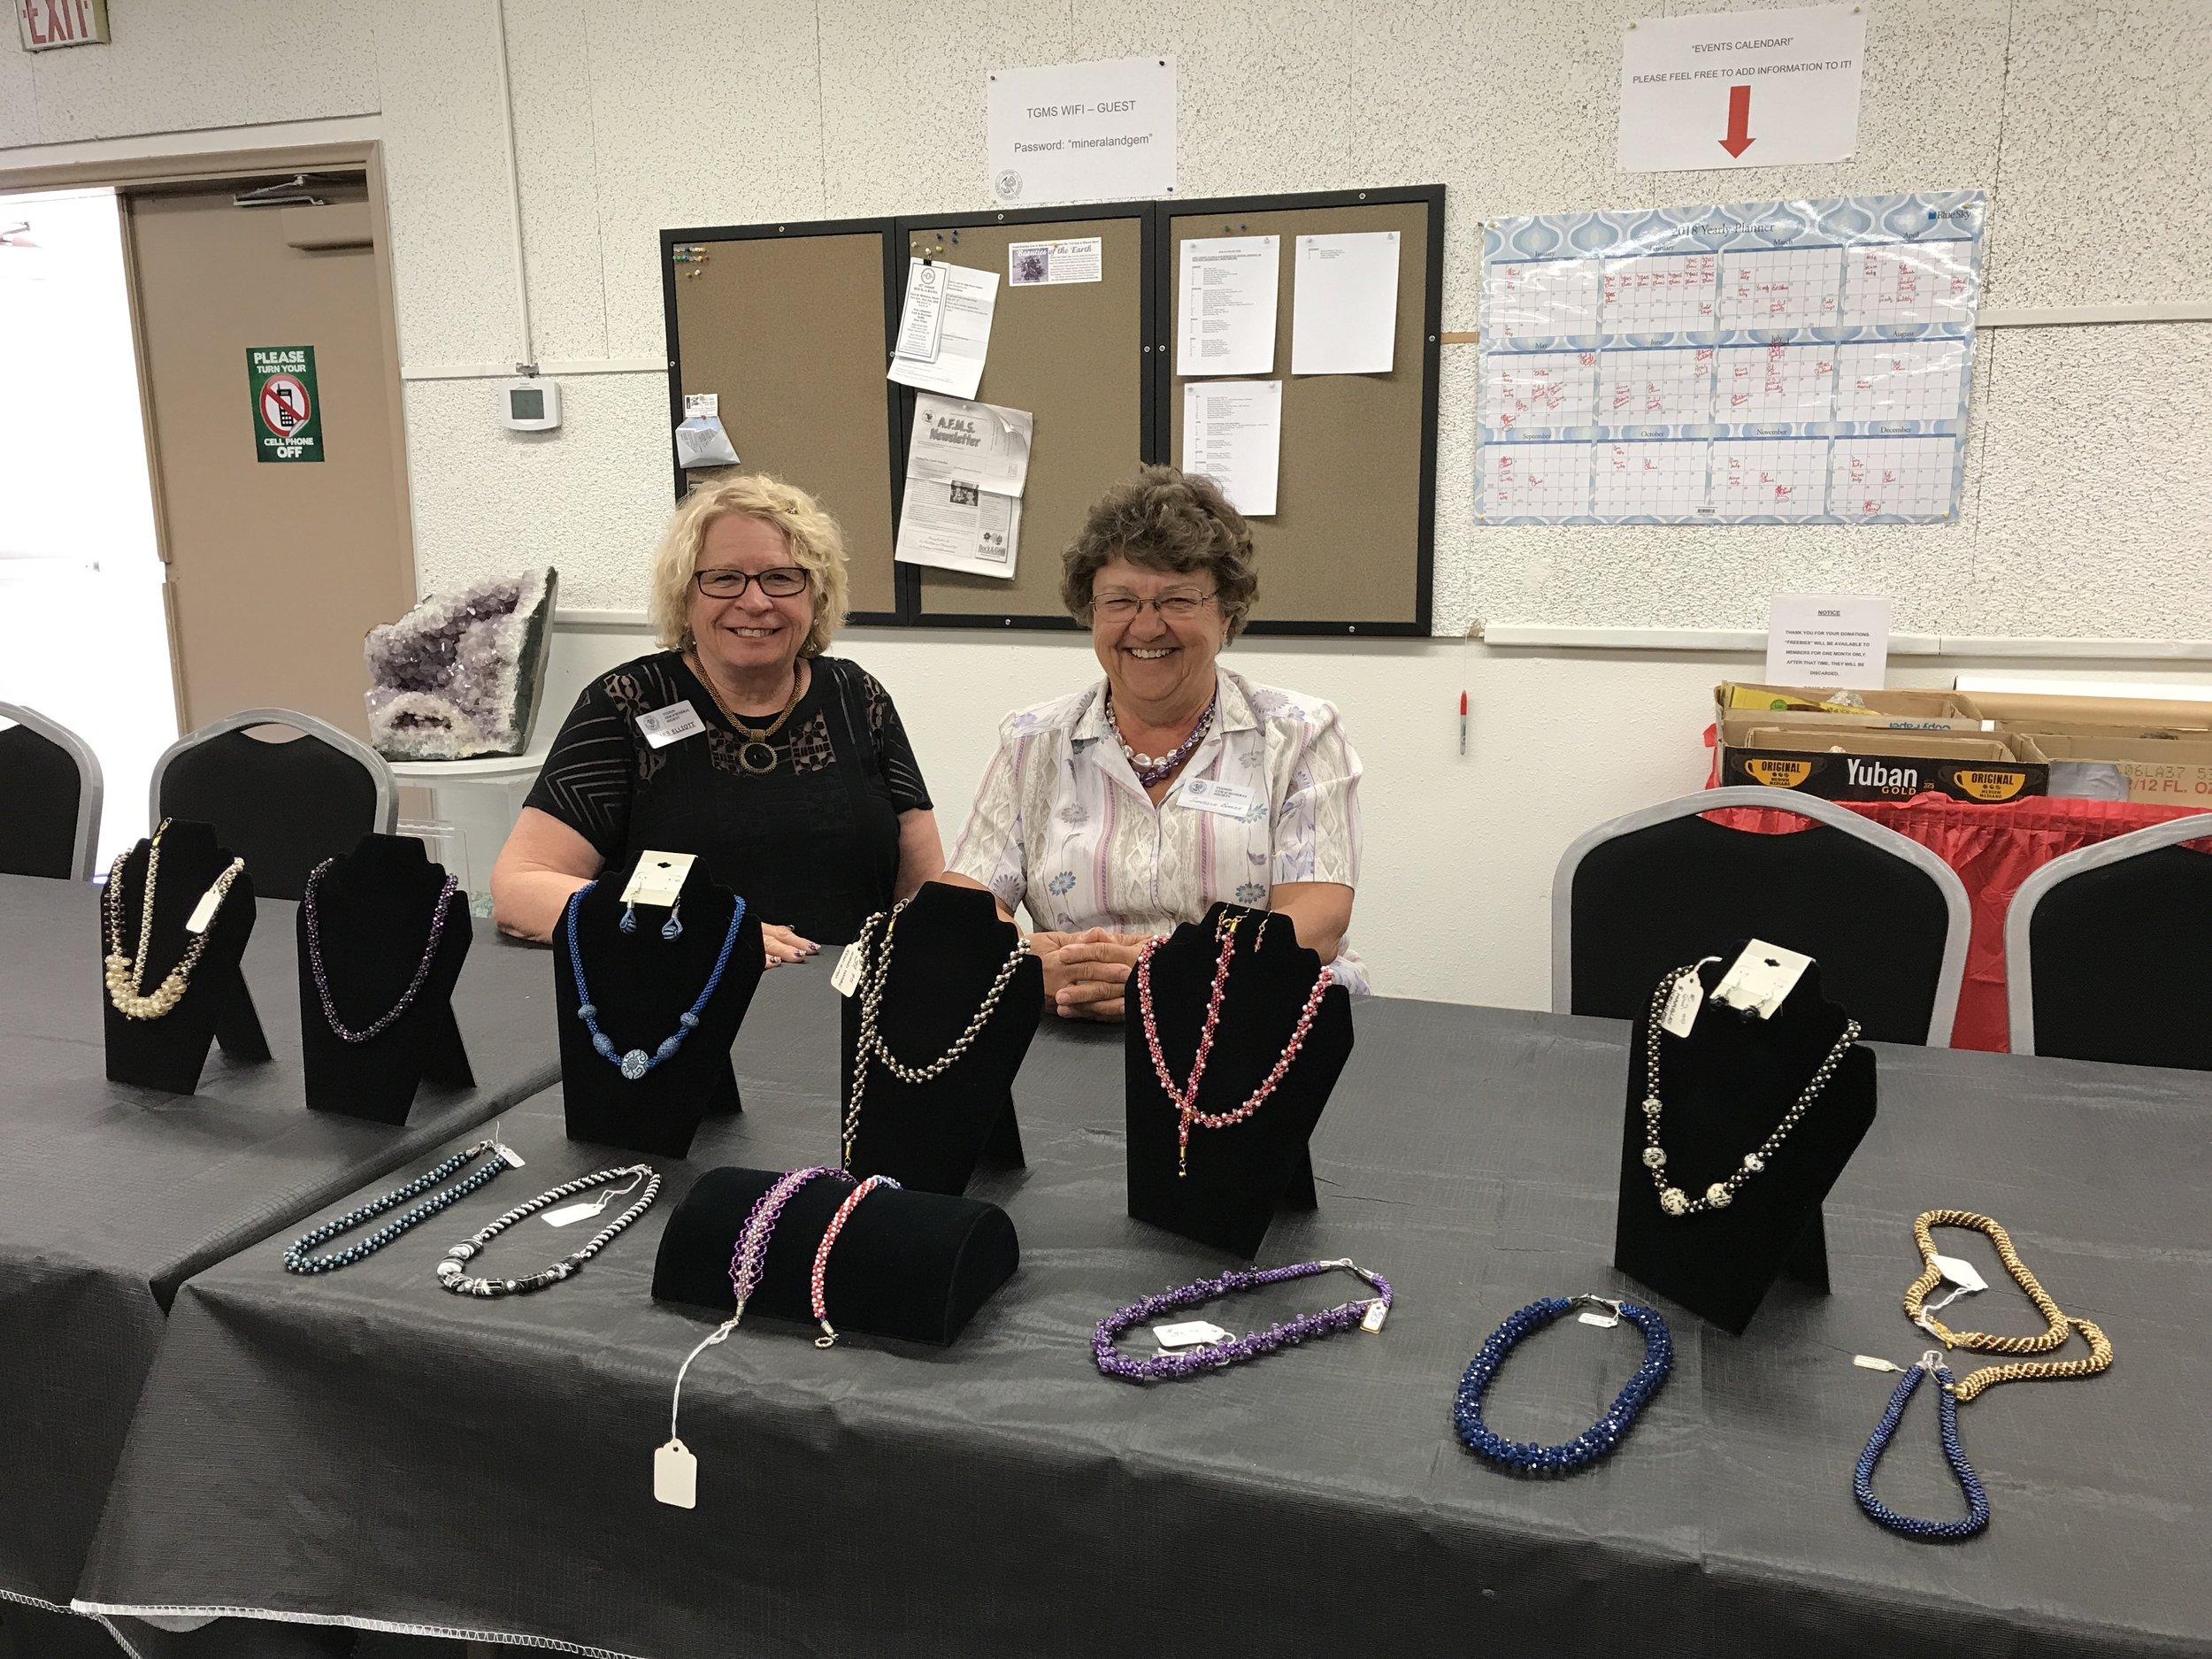 Our wonderful instructors ... Barb & Sharlene